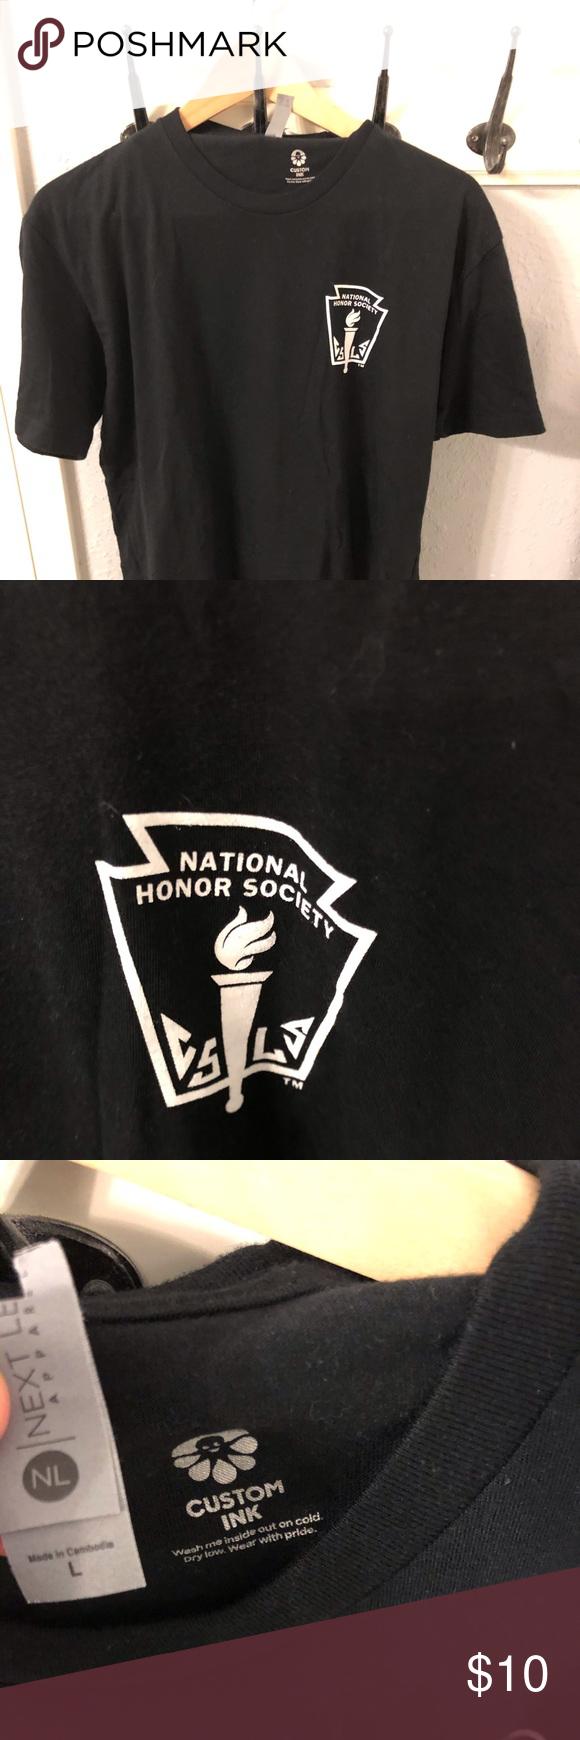 National Honor Society tshirt. Size L National Honor